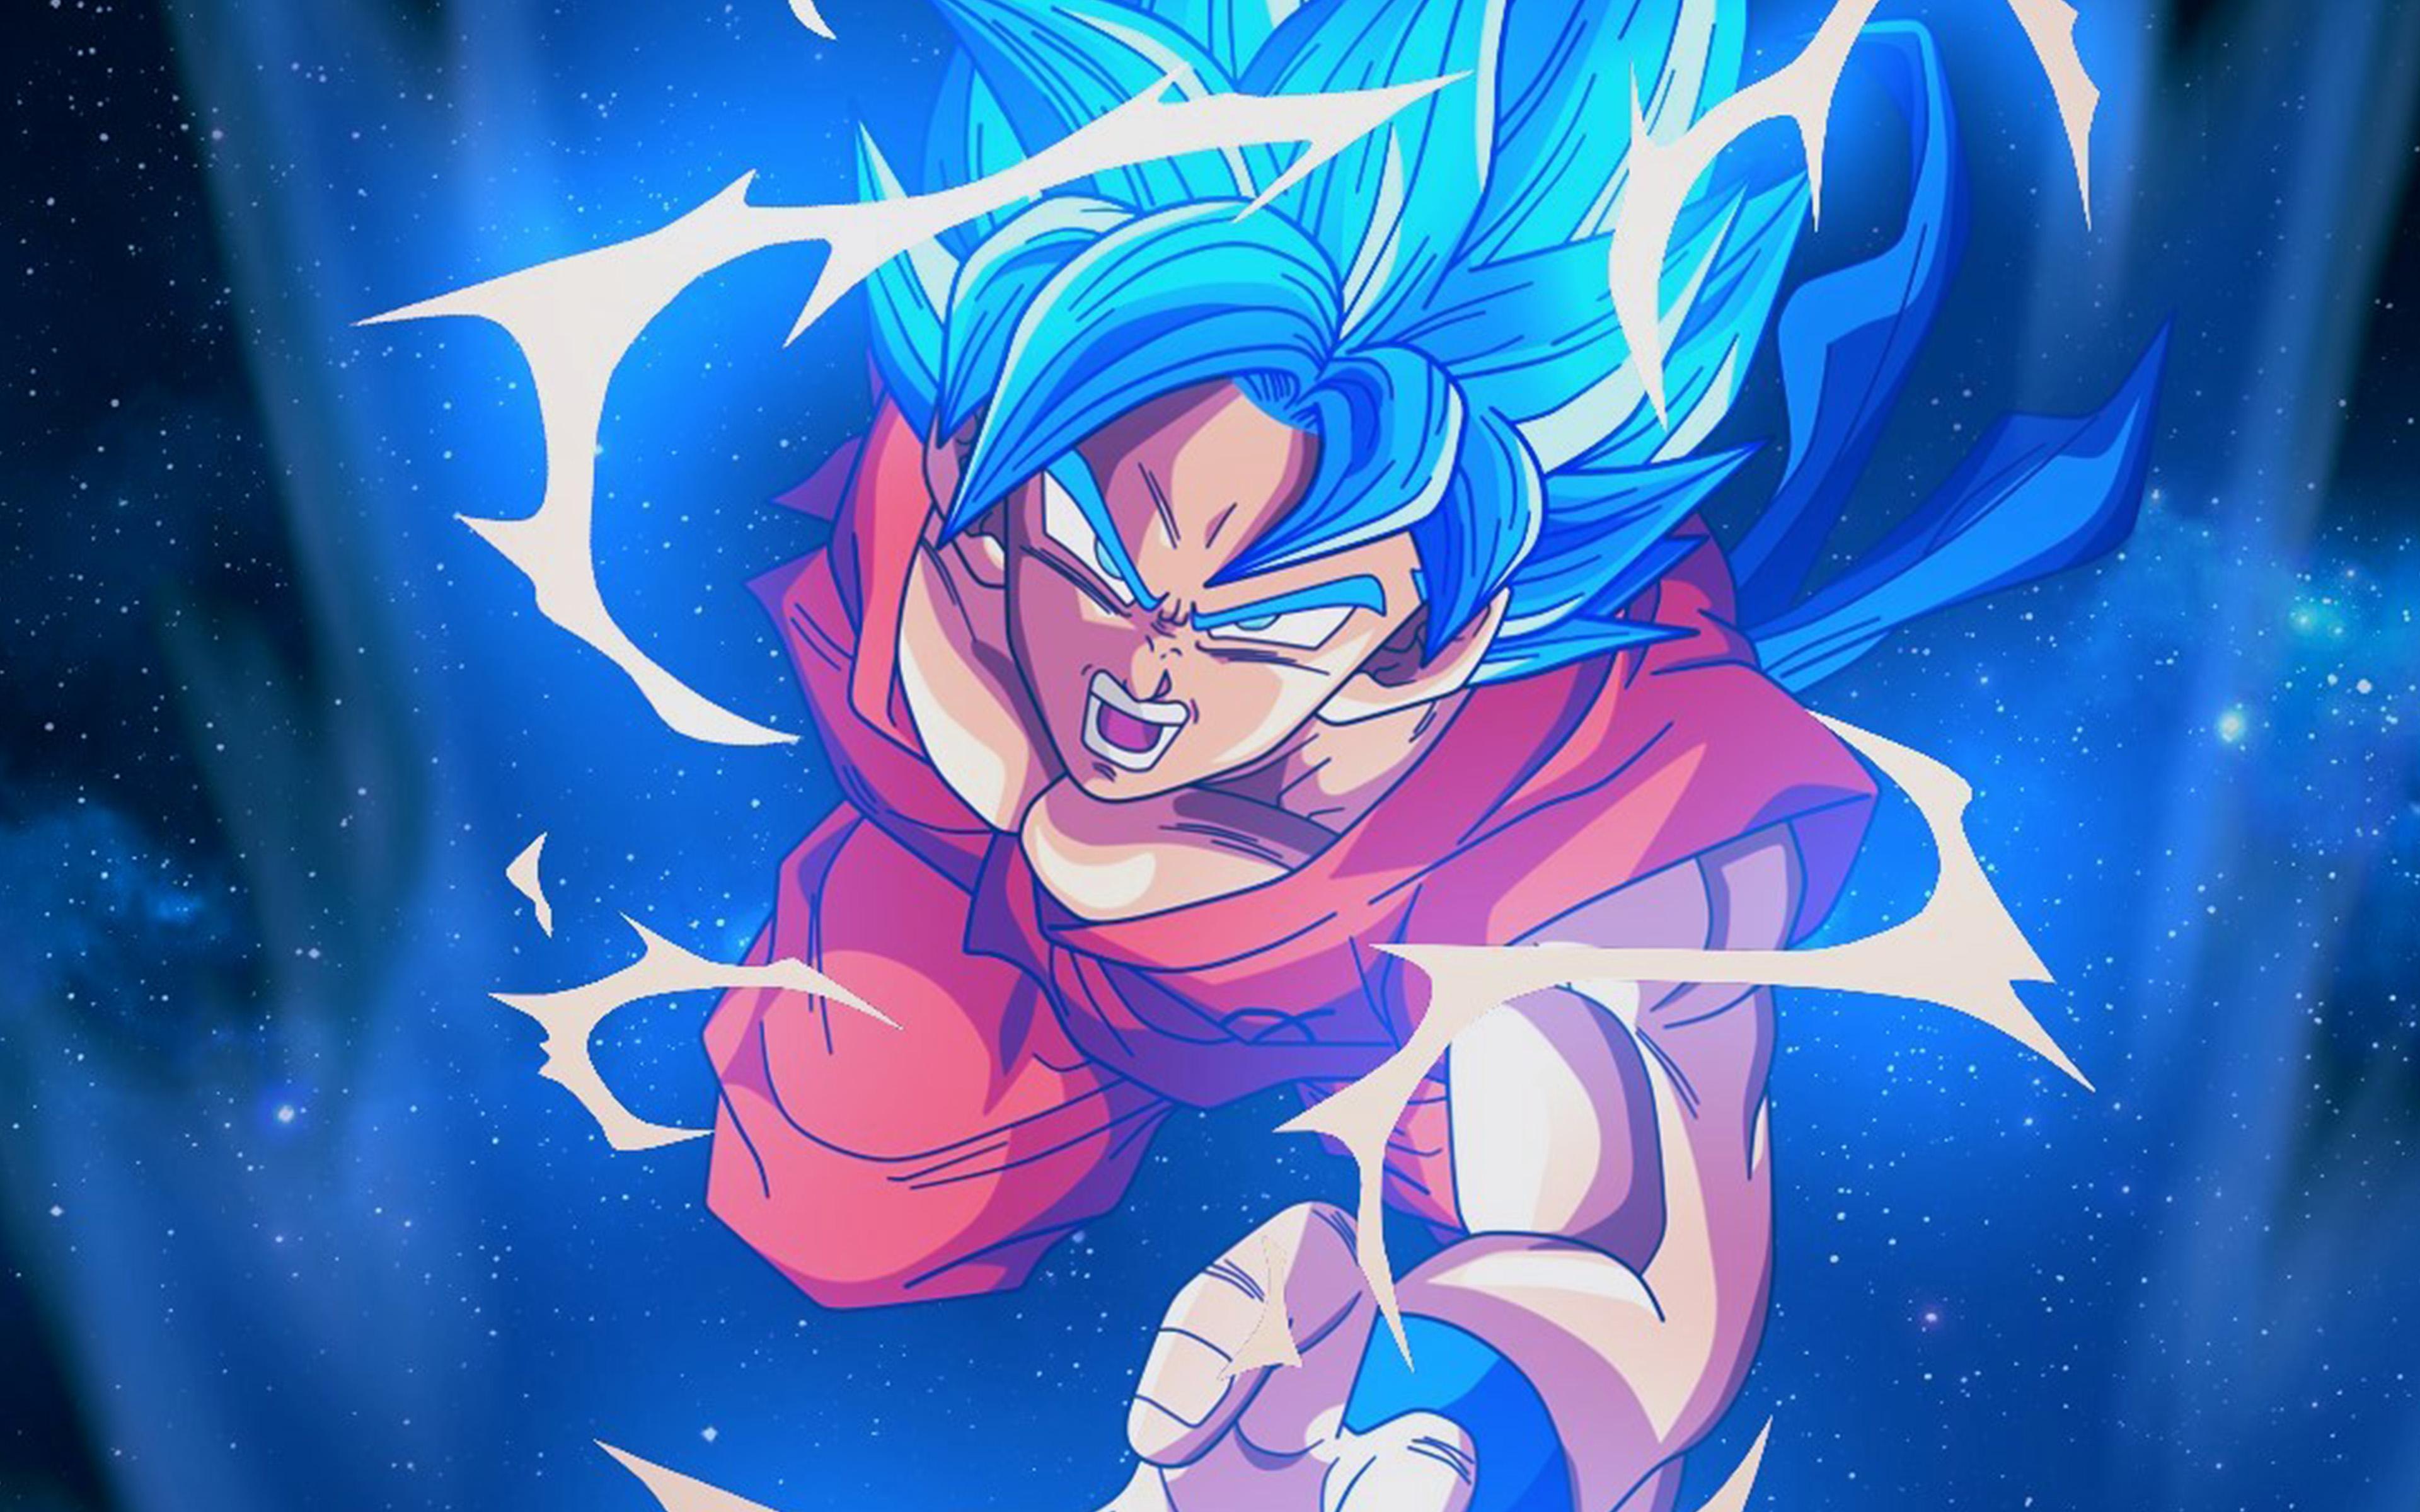 Goku Wallpaper Hd Bc54 Dragonball Goku Blue Art Illustration Anime Wallpaper